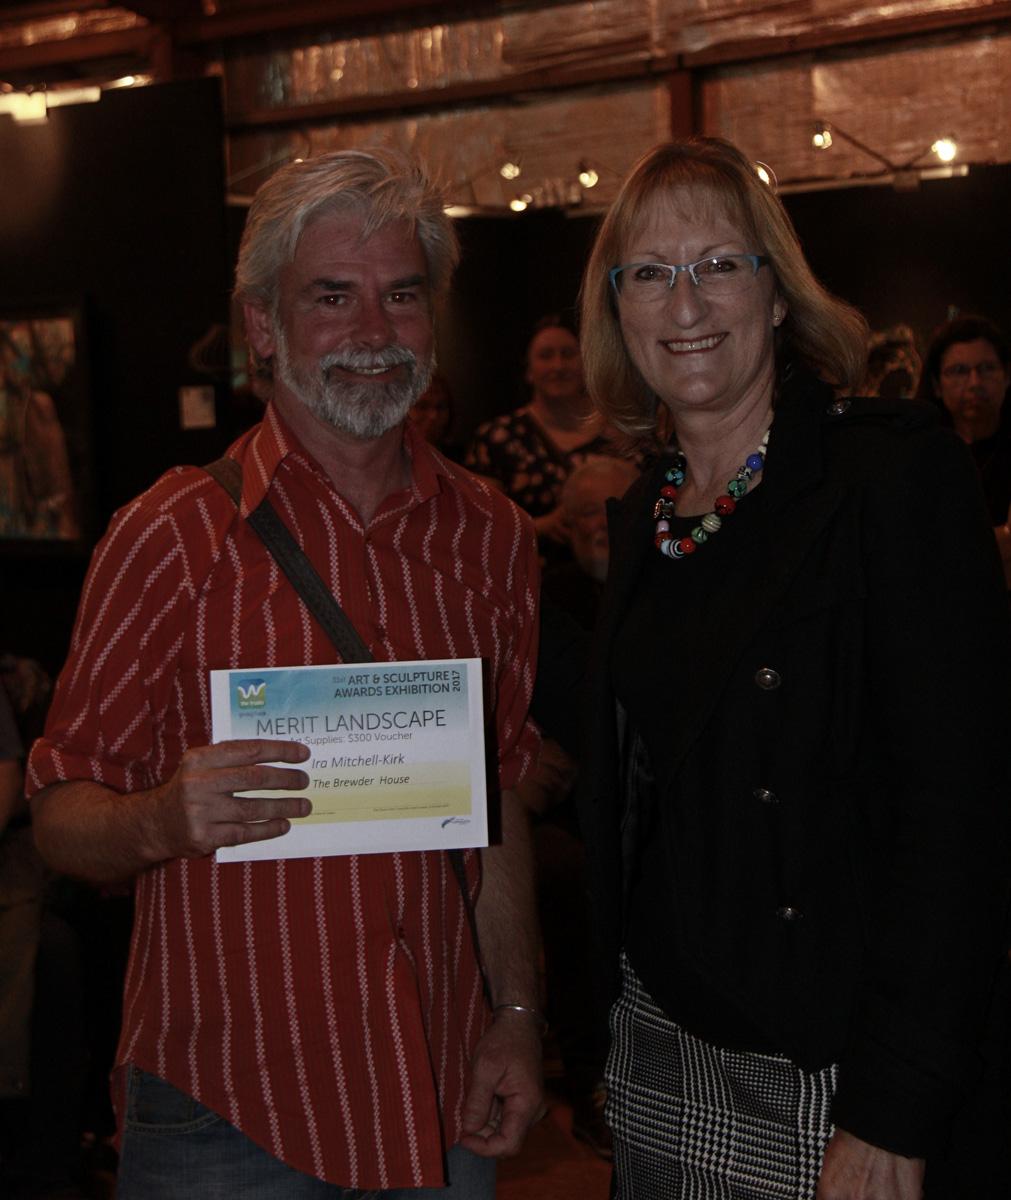 00044 On behalf of Ira Mitchell Kirk & Linda Cooper